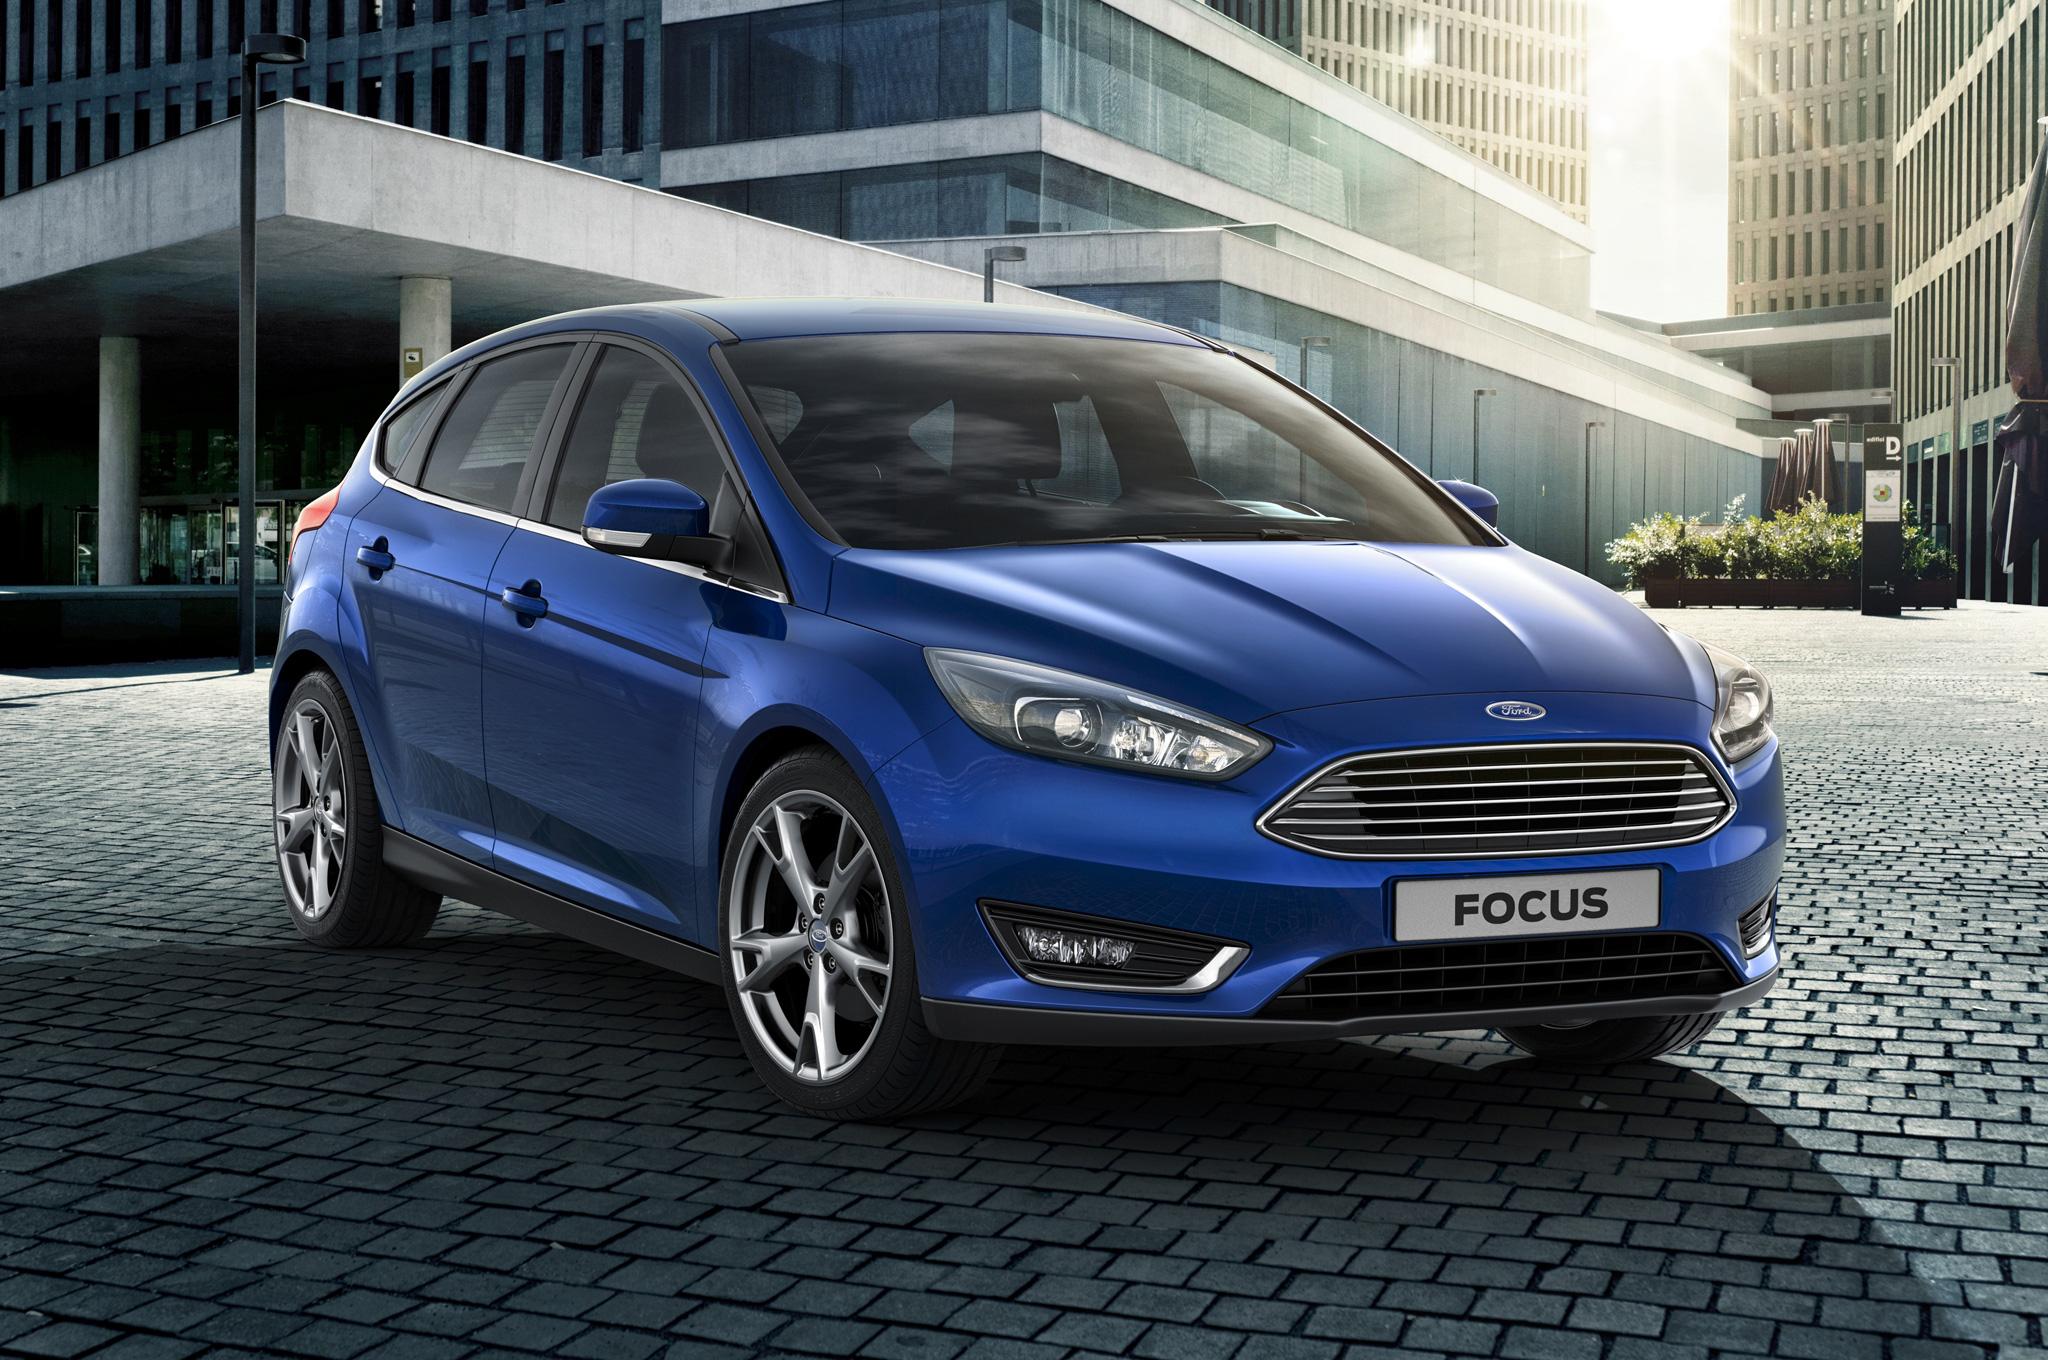 2015-ford-focus-hatchback--front-side-view